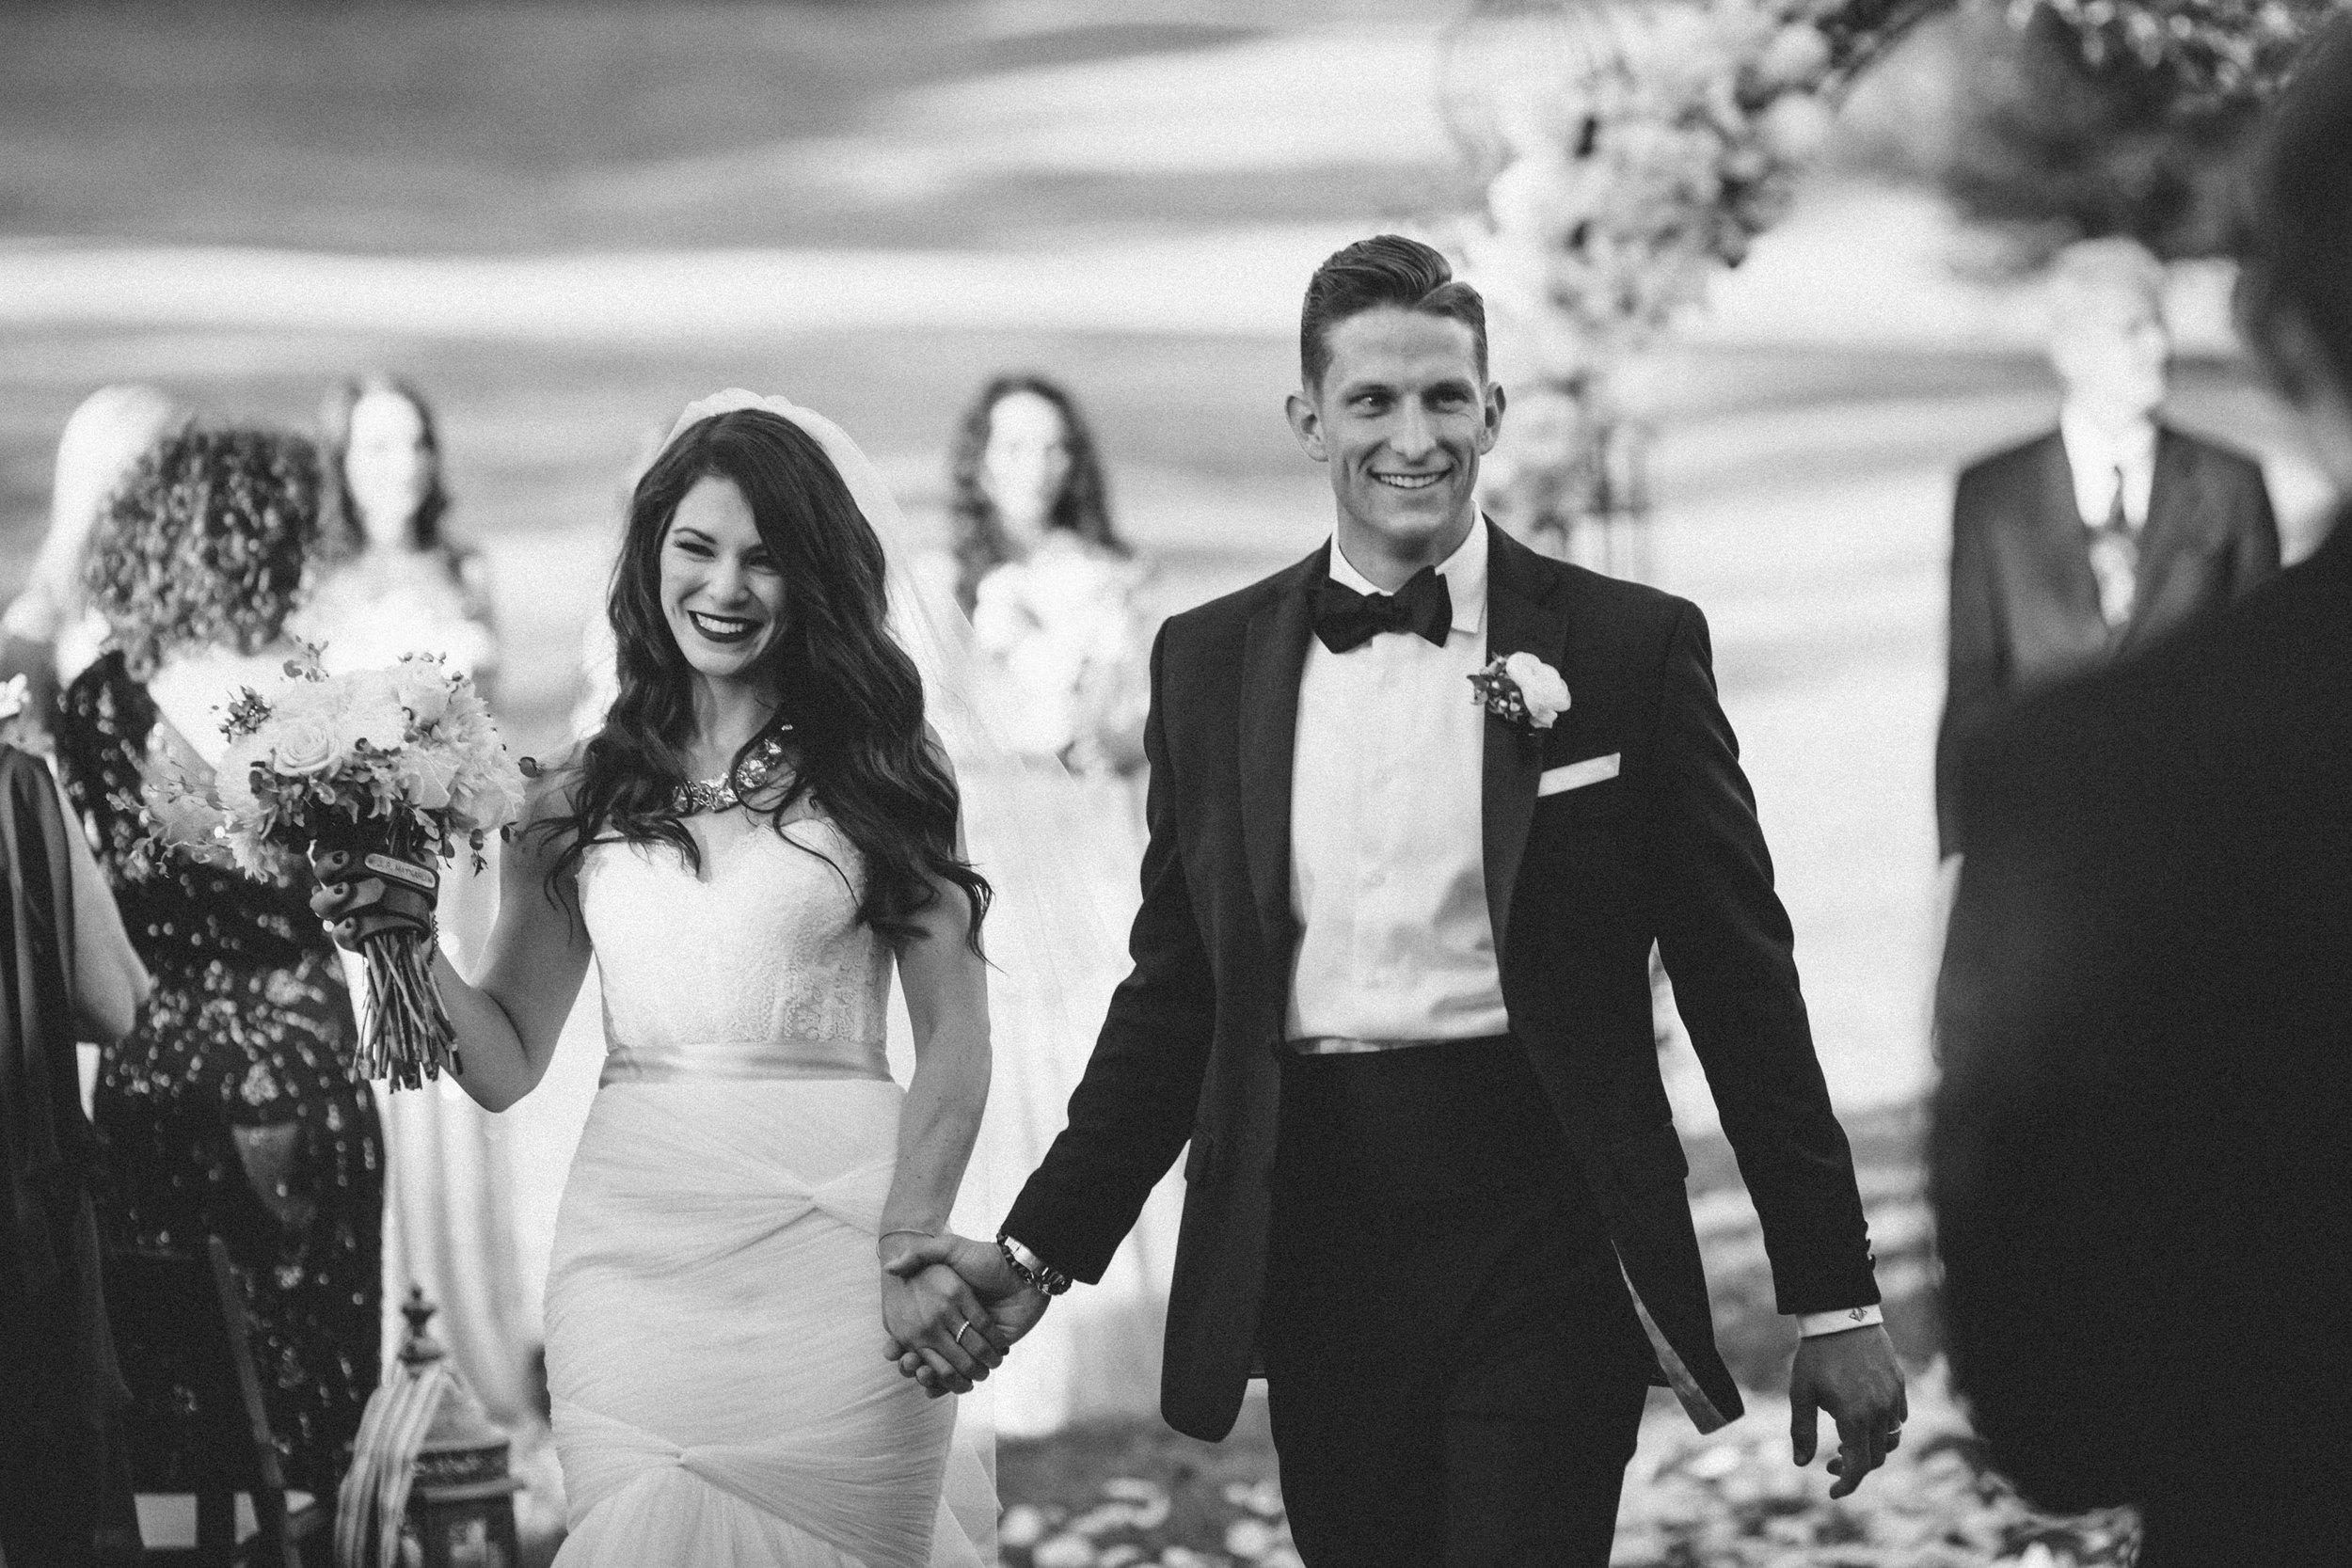 Me & Mr. Jones Wedding, Black Tie Wedding, Rustic Glam Outdoor Wedding, Rose Petal Aisle, Black and White Wedding Photos, Mr. & Mrs. Jones!